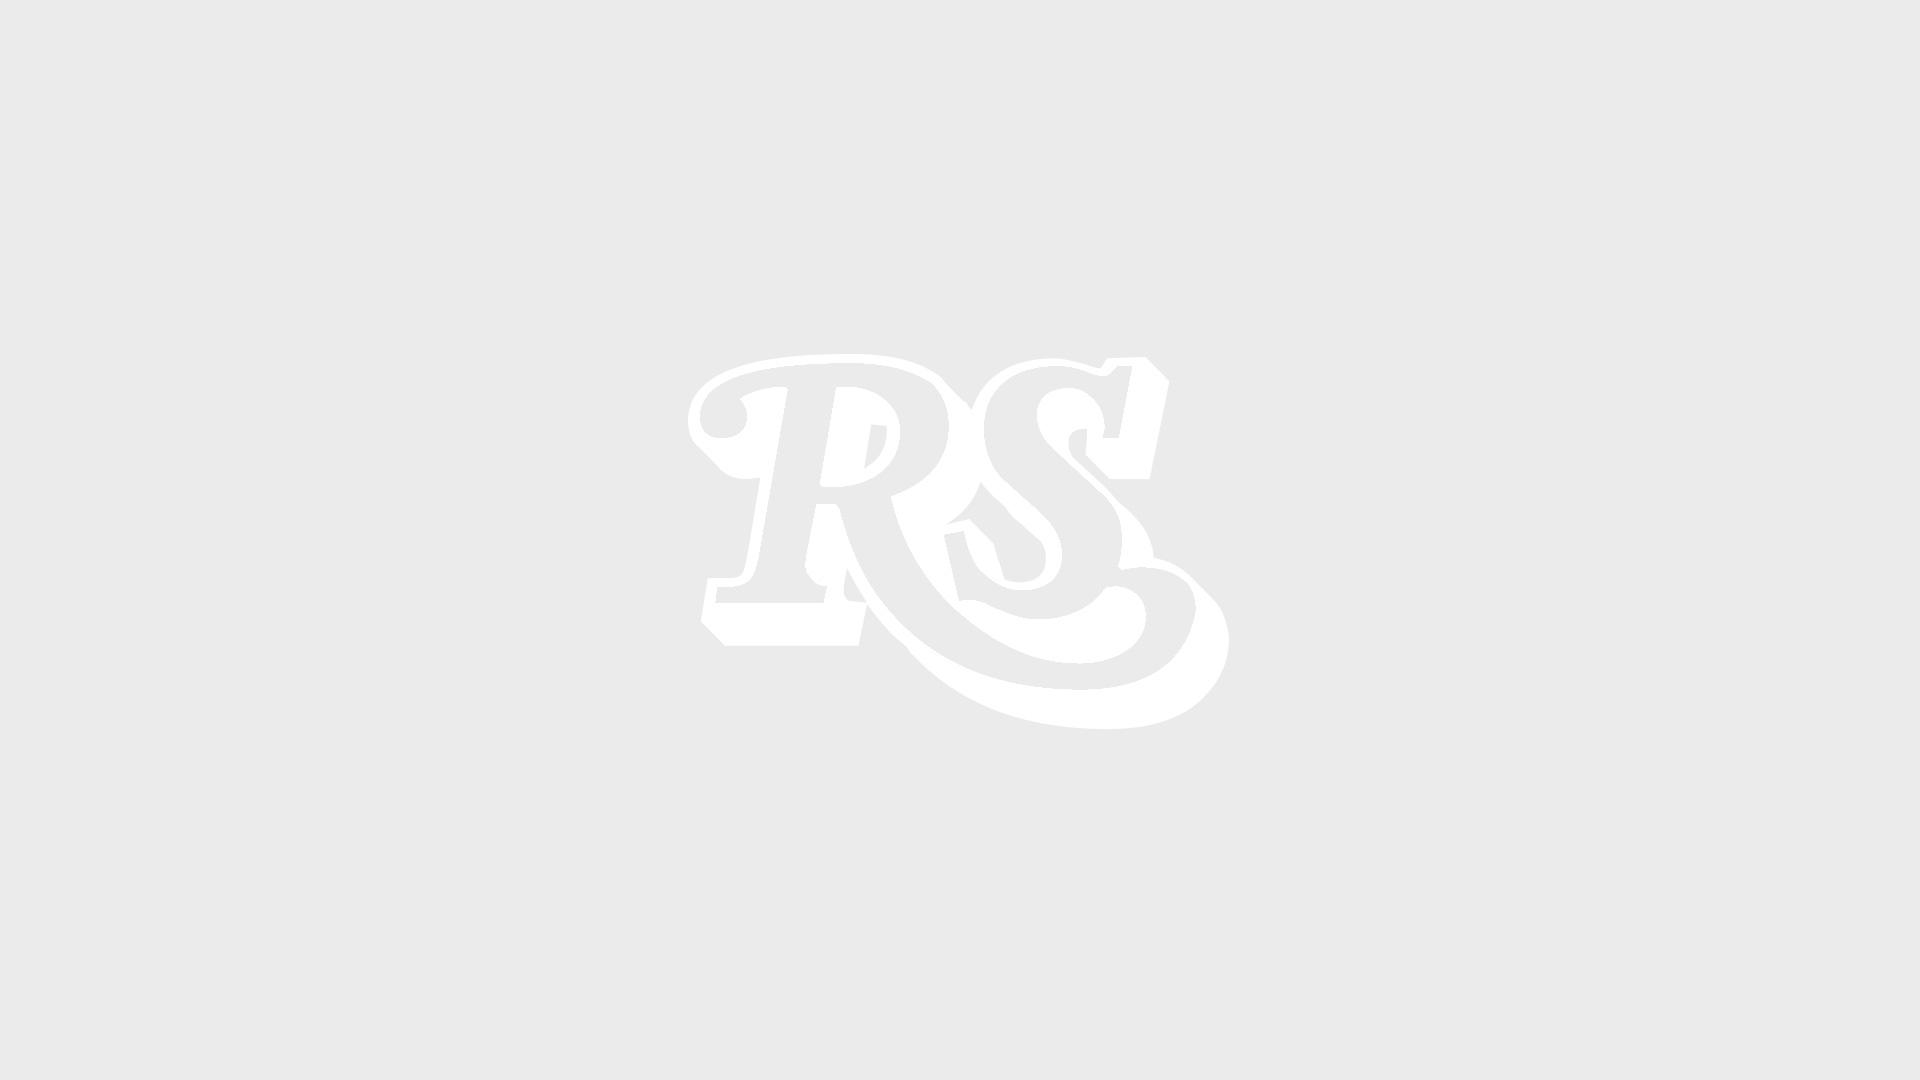 Axl Rose (Photo by Ke.Mazur/WireImage)